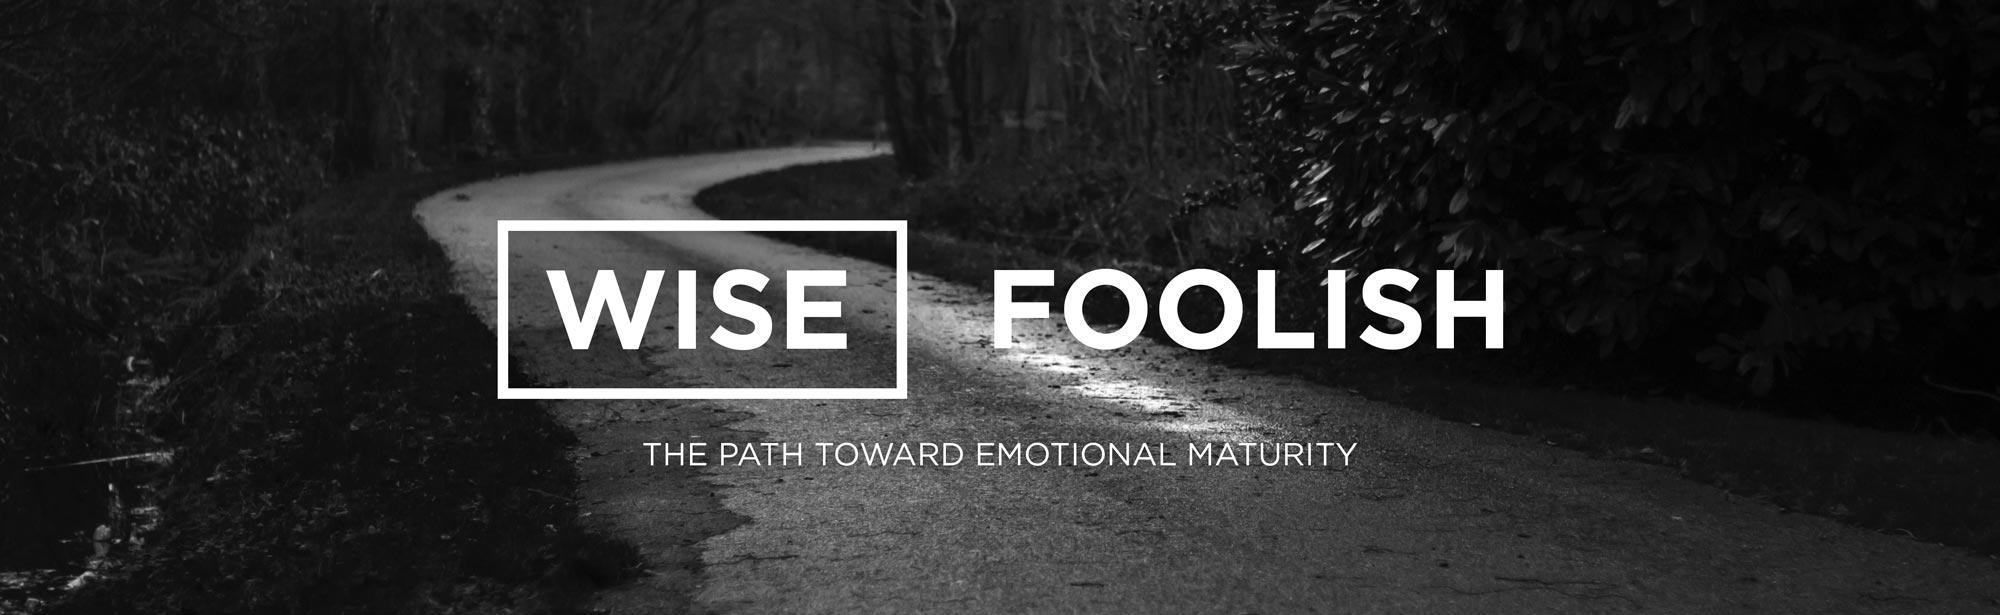 Wise-Foolish - The Path to Emotional Health - Sermon Series - Grace Community Church